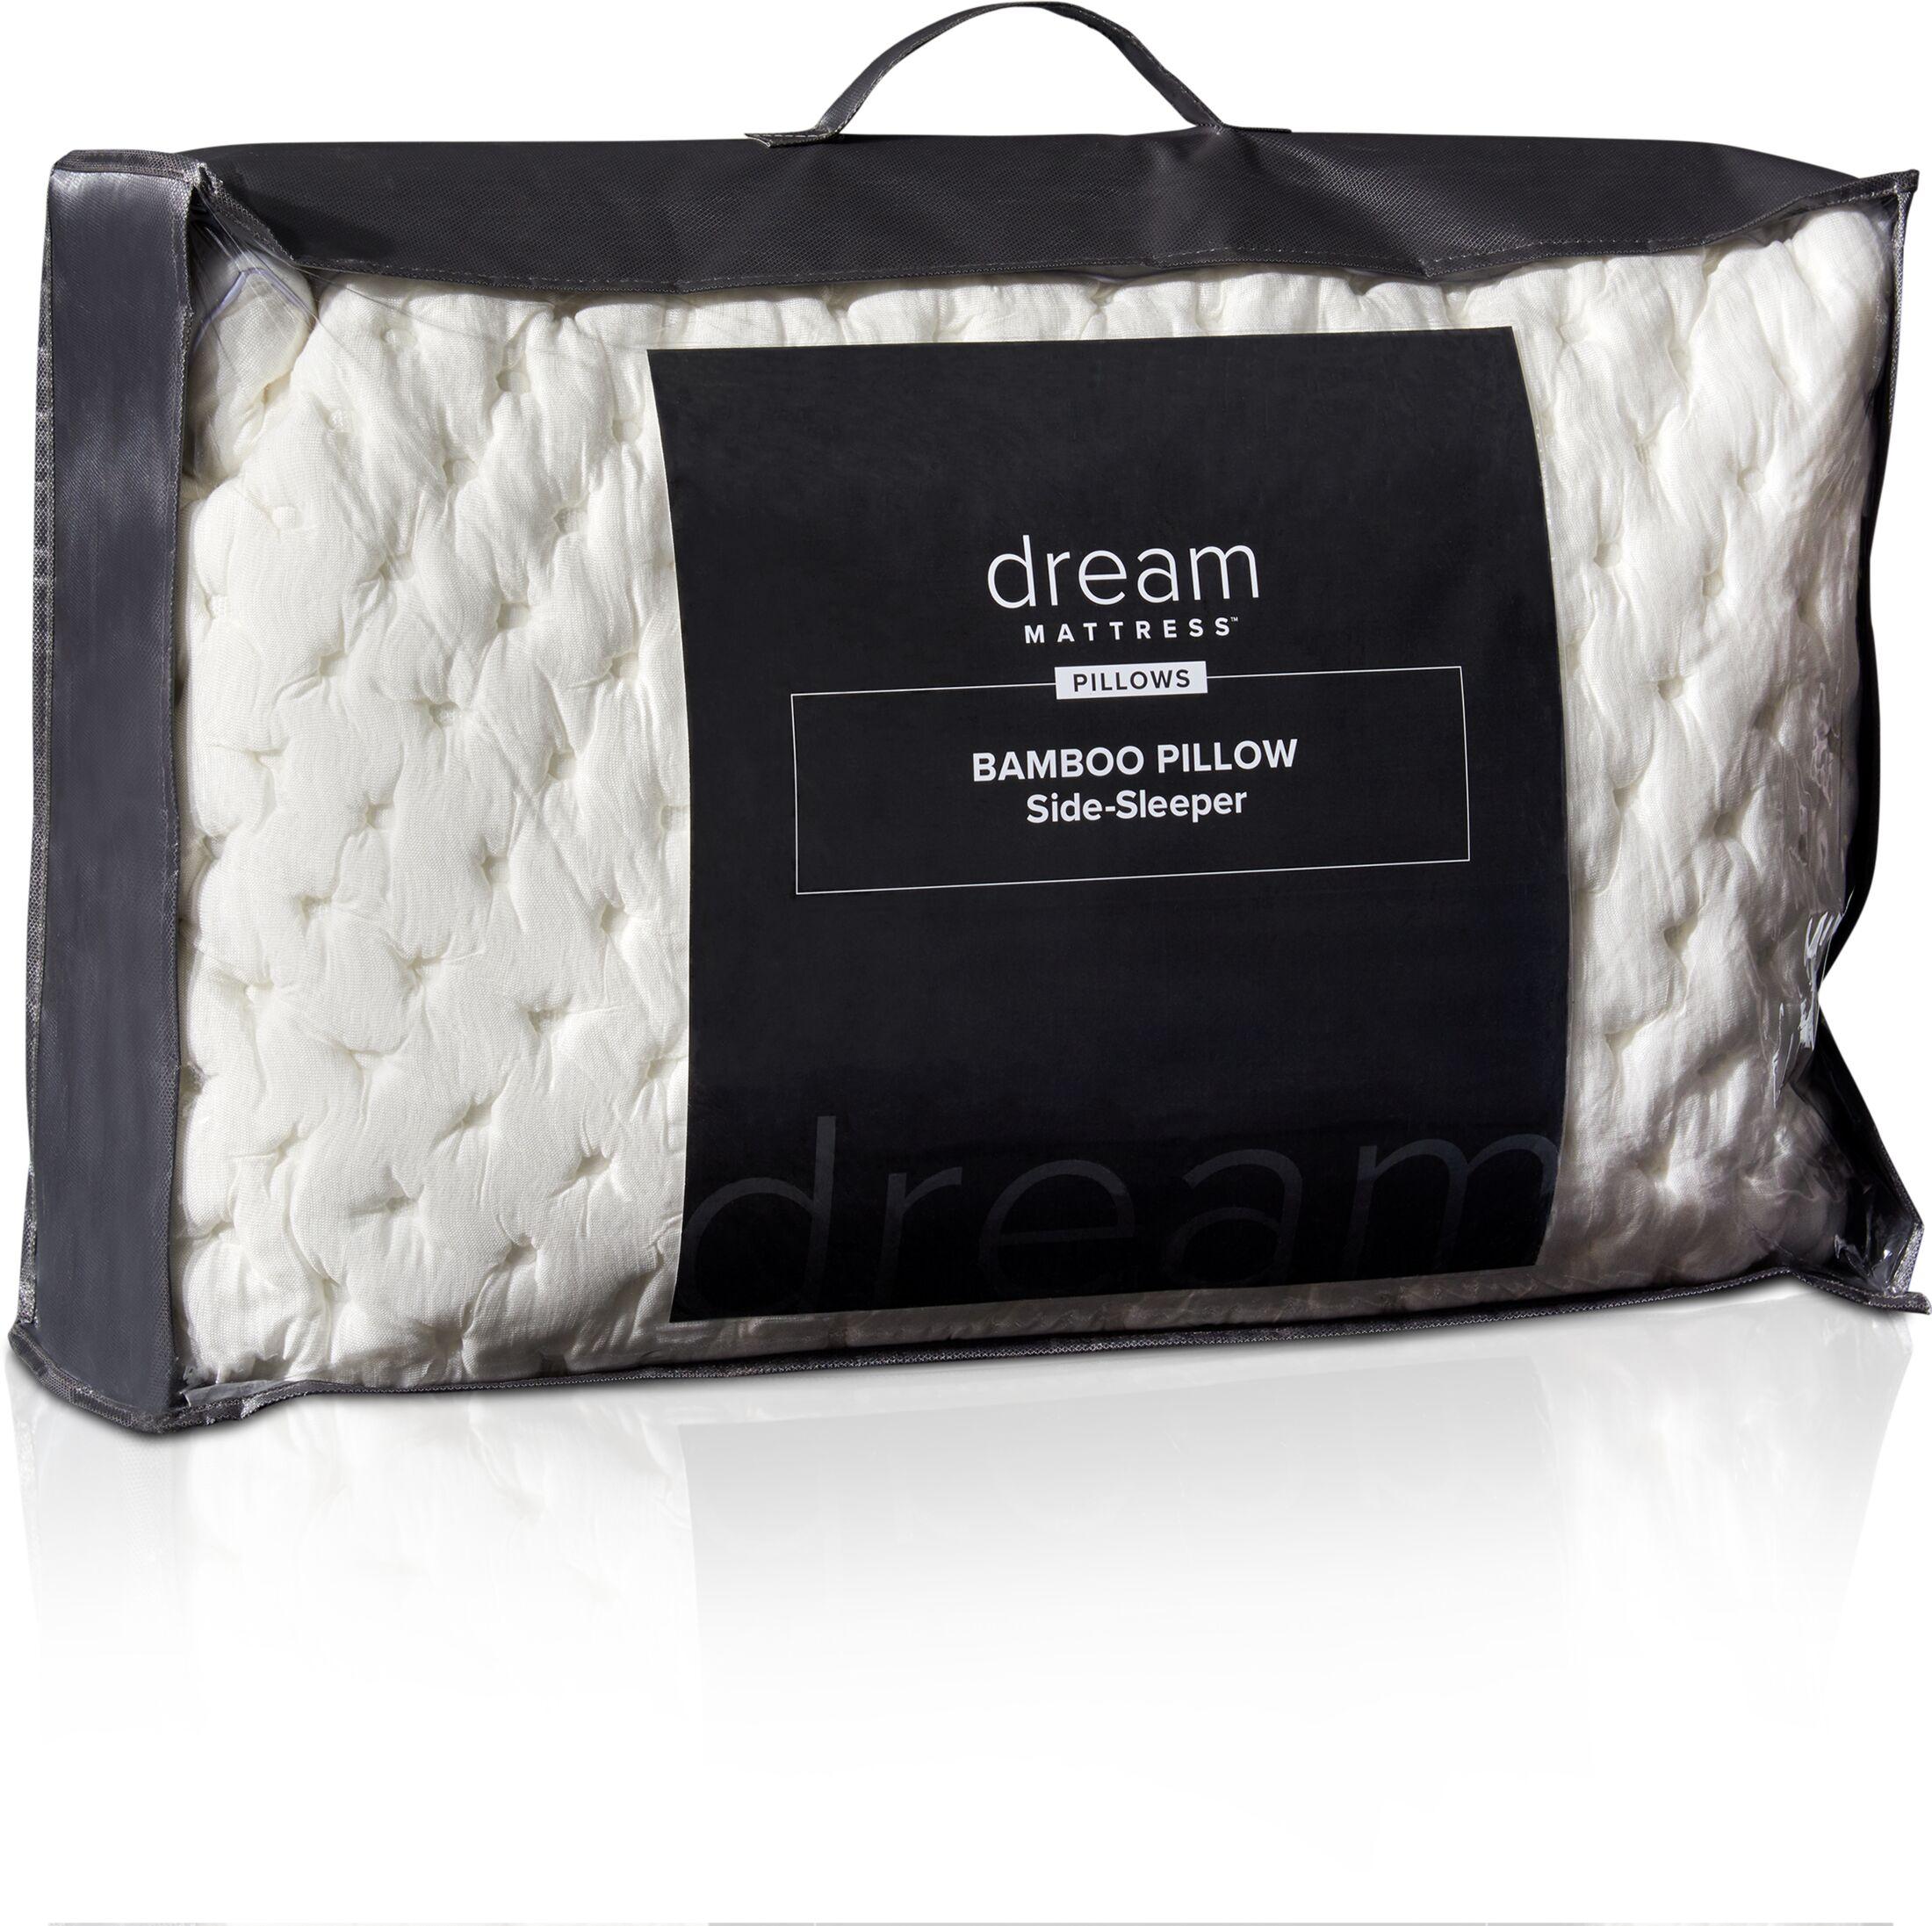 Mattresses and Bedding - Dream Side Sleeper Bamboo Pillow